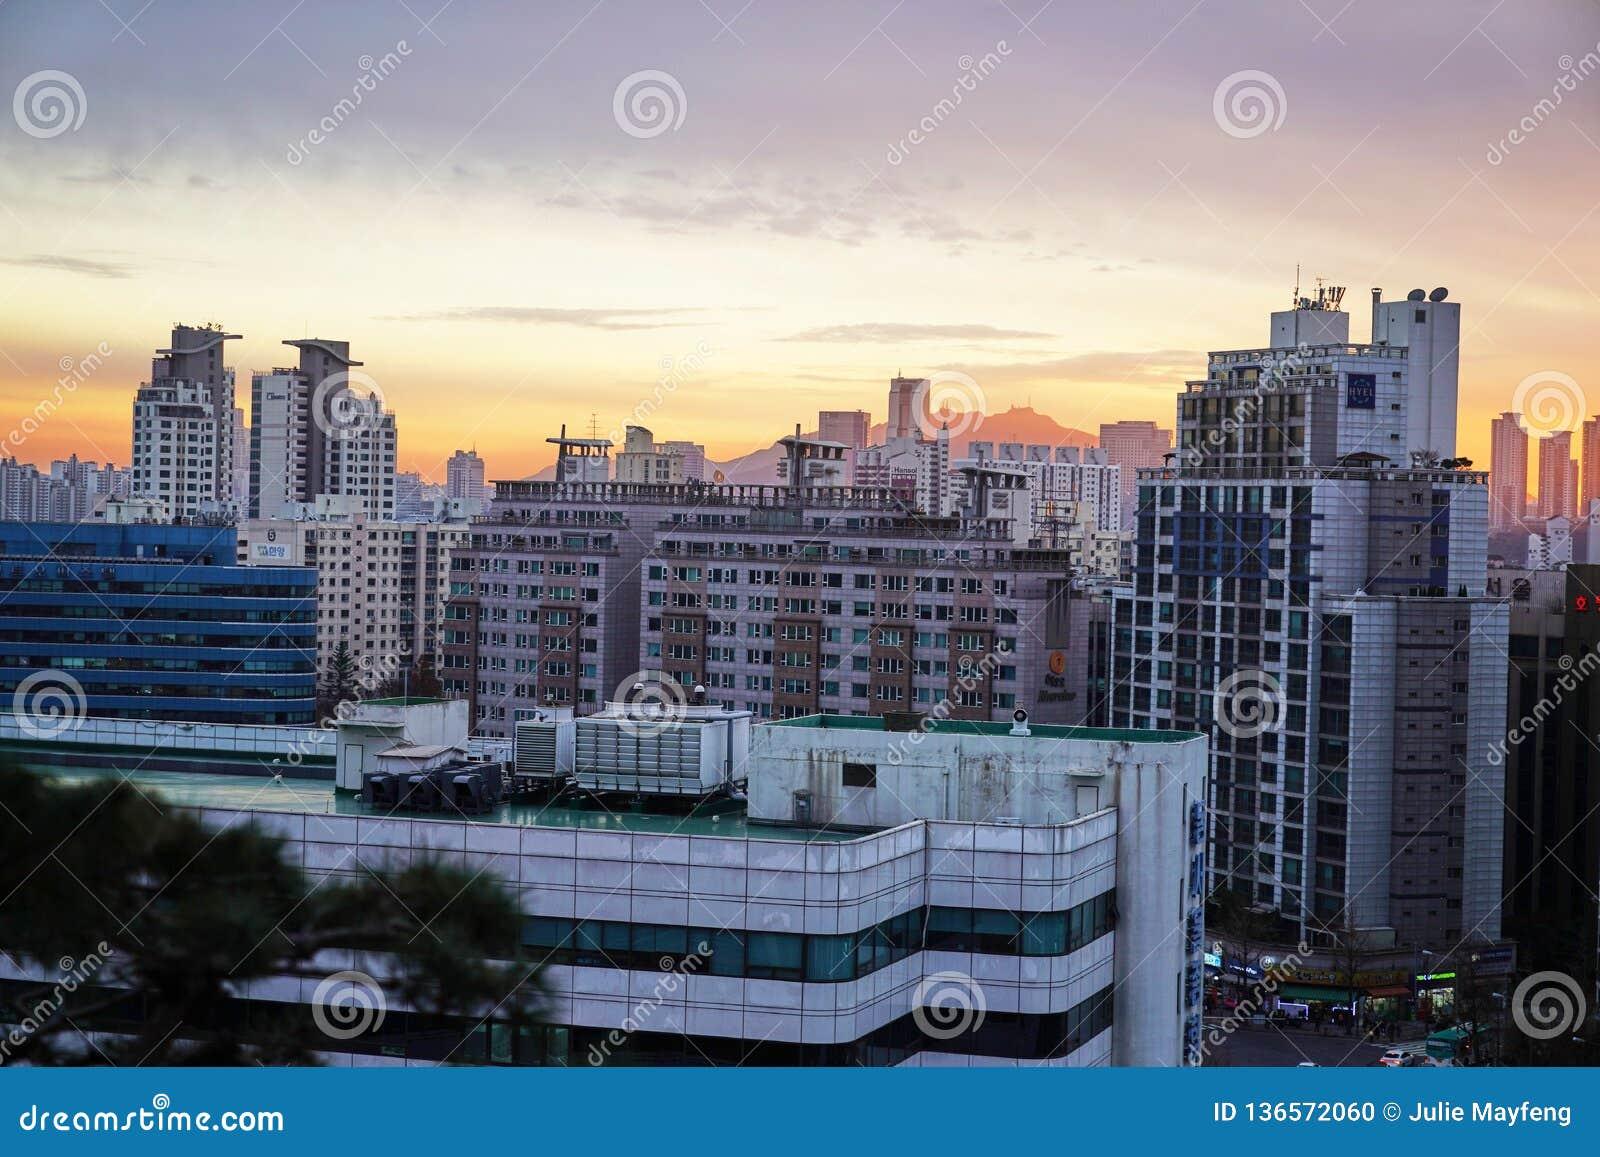 Apartments In Seoul South Korea Editorial Image Image Of Bridge